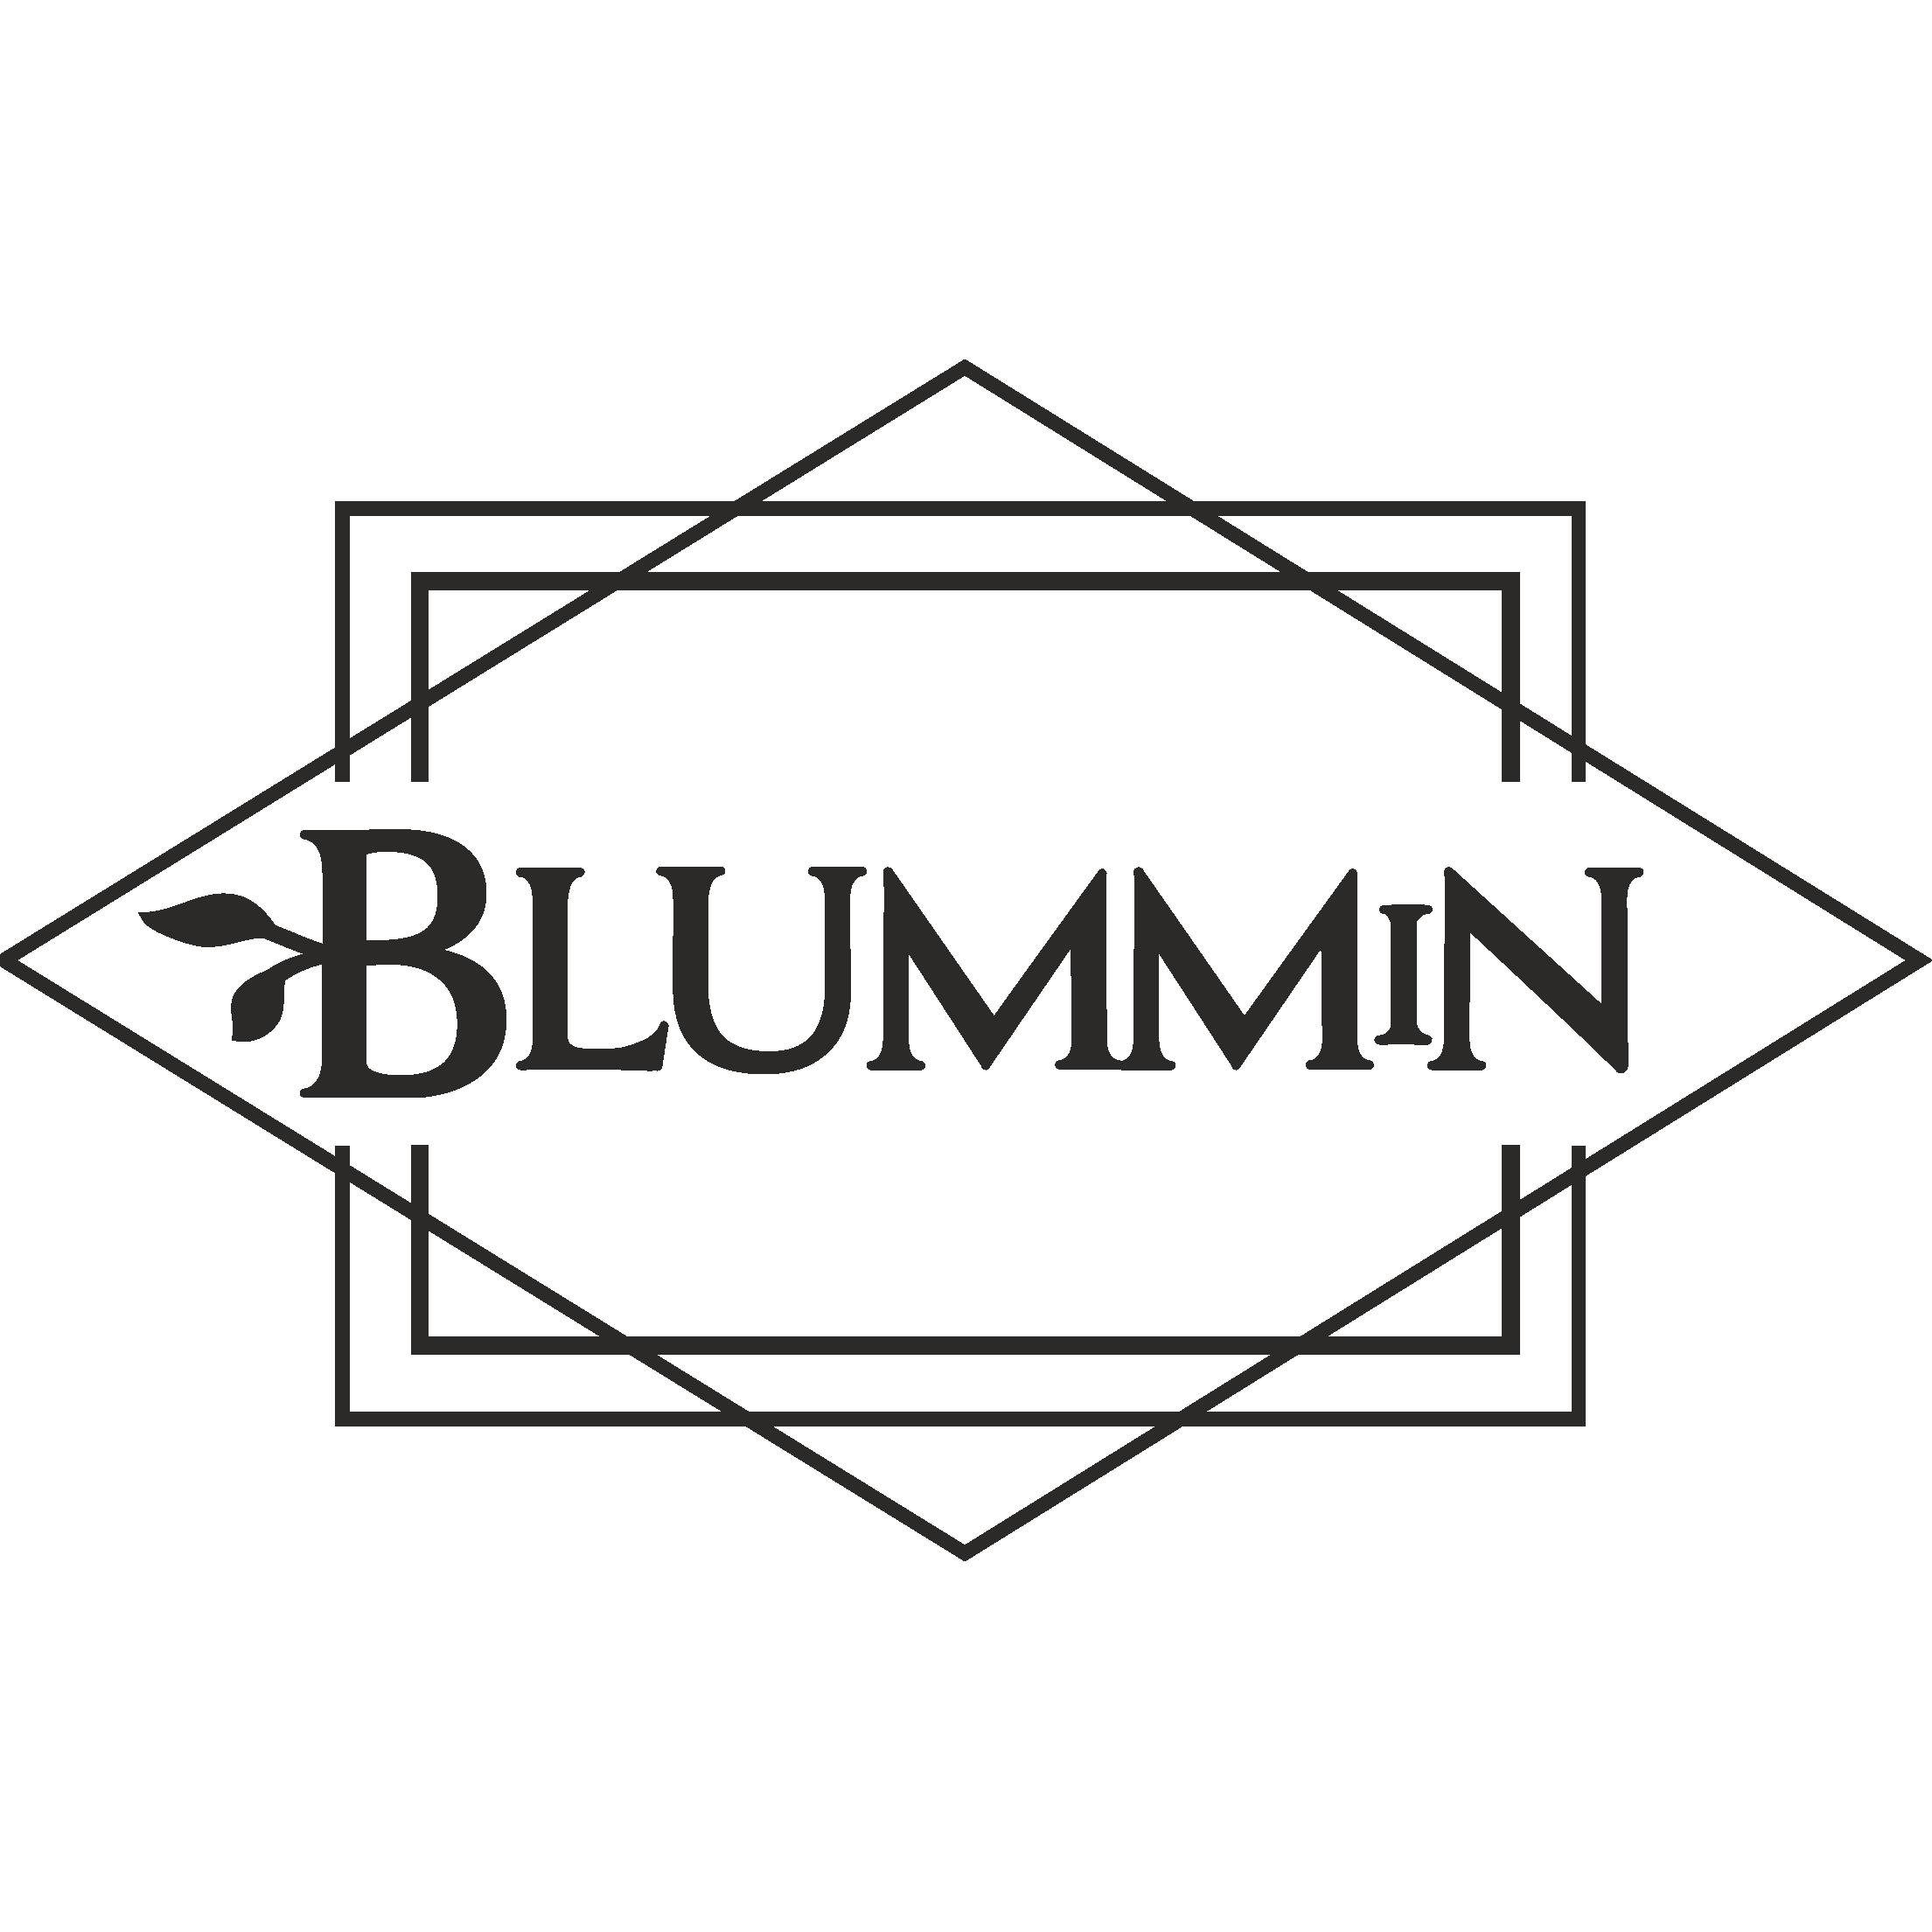 Blummin (EA GROUP OÜ)